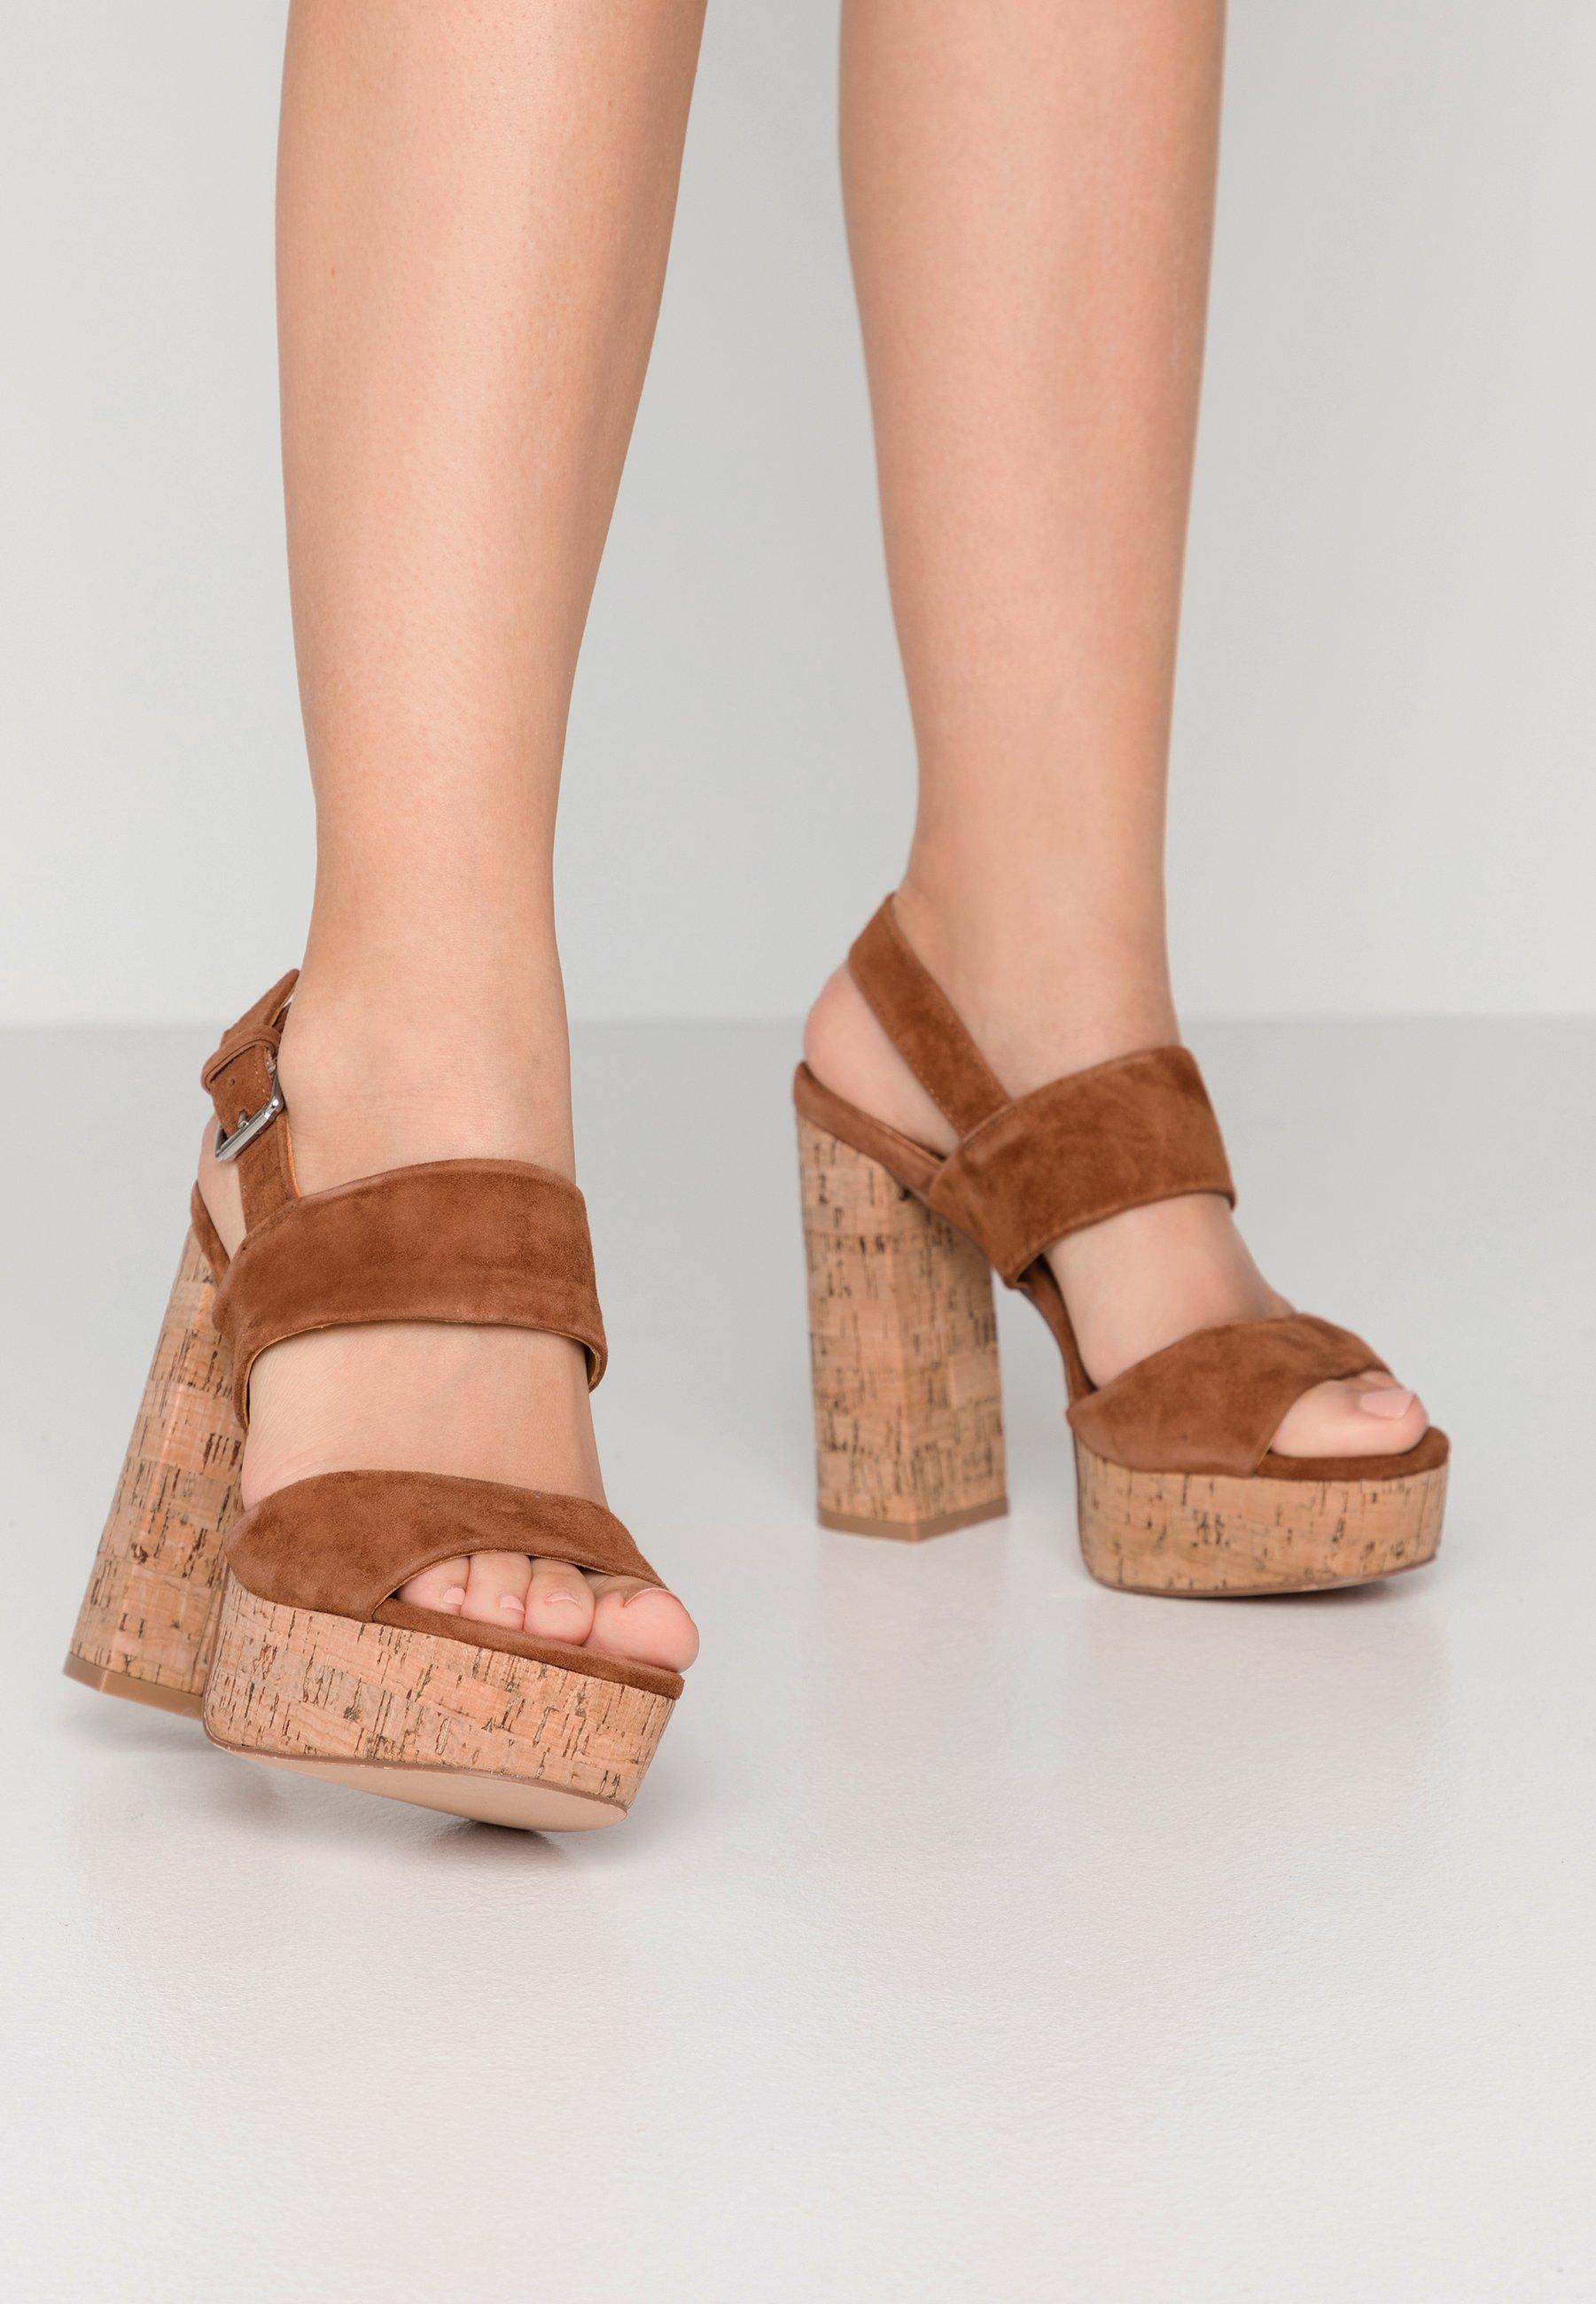 Even&odd Leather - High Heeled Sandals Cognac